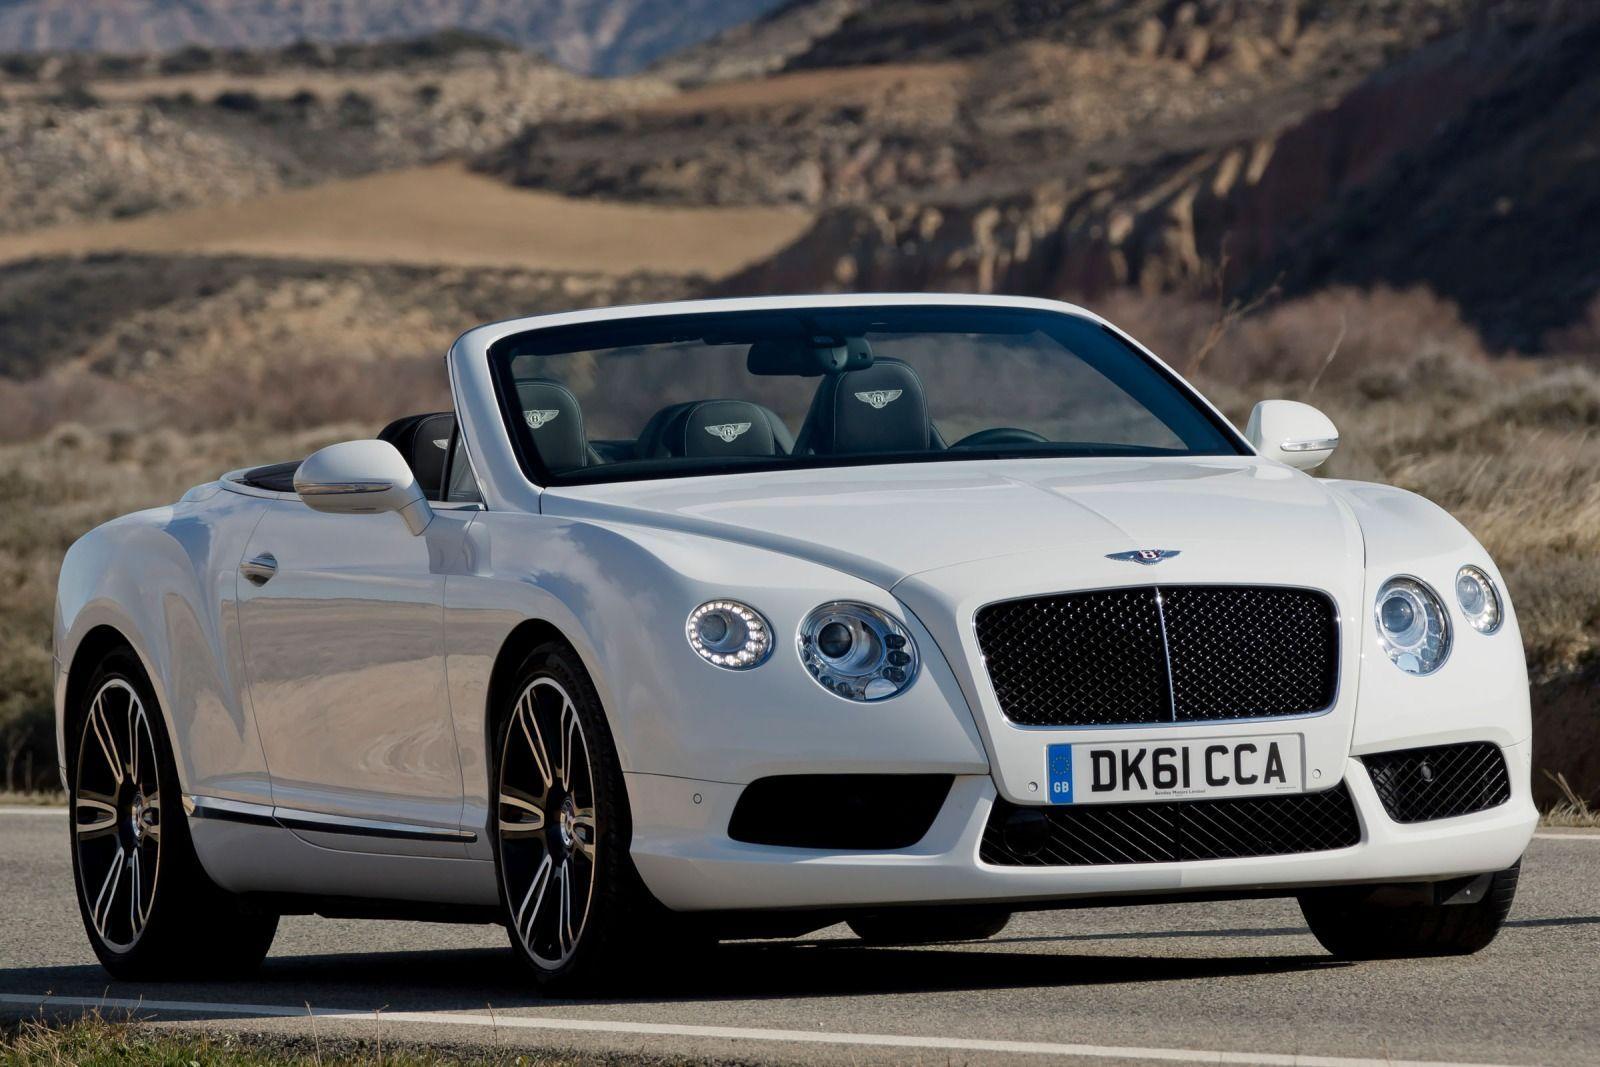 2015 Bentley Continental GT Speed Convertible White HD Wallpaper ...